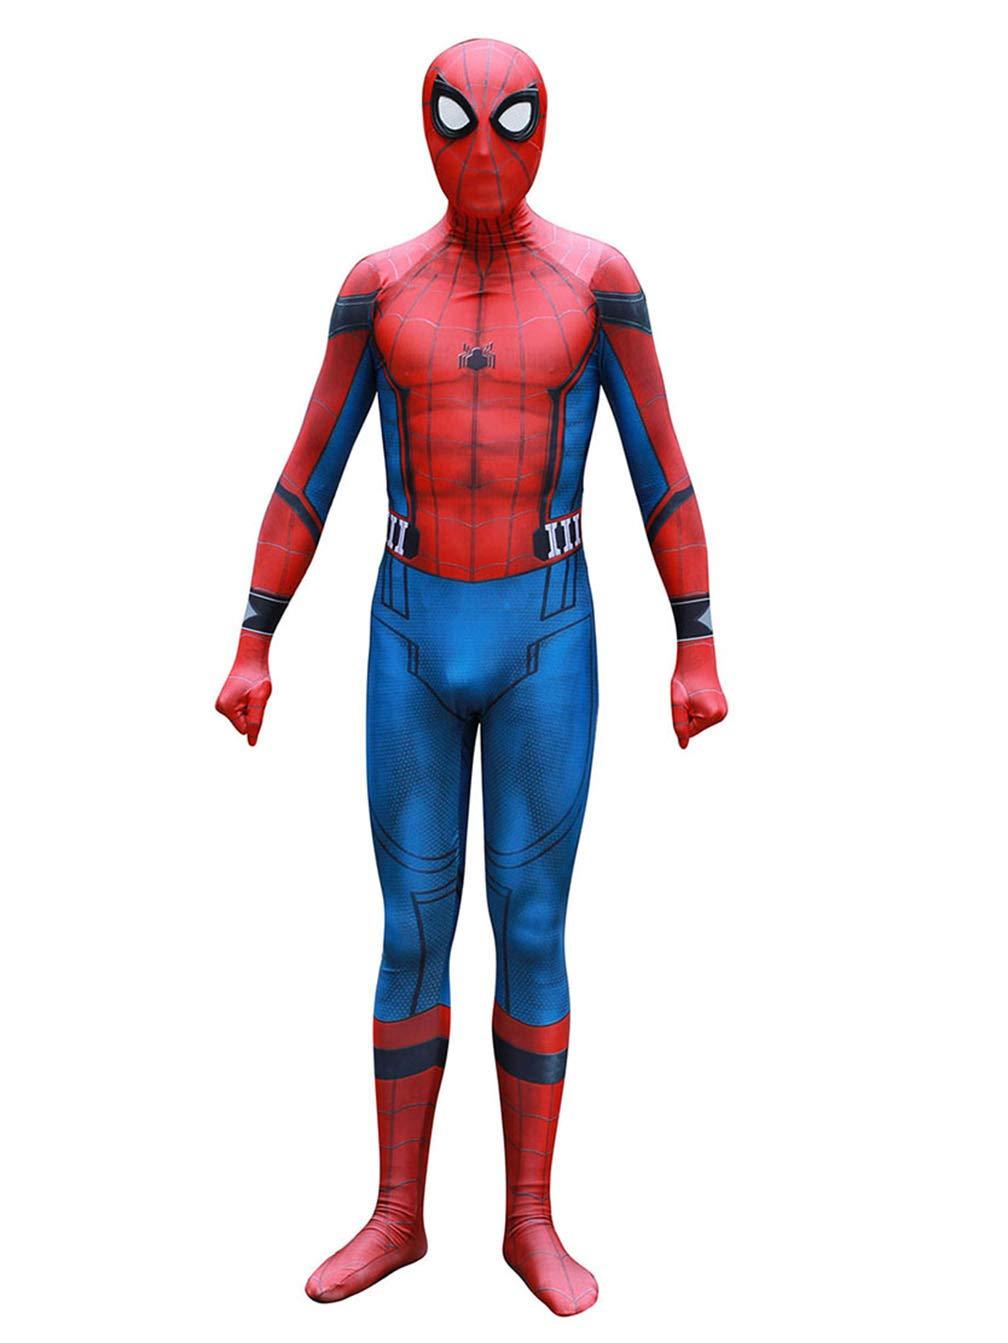 - 61AYSIkxYhL - Crazycos Unisex Adult Kids Spandex 3D Zentai Suit Costume Cosplay Bodysuit Halloween